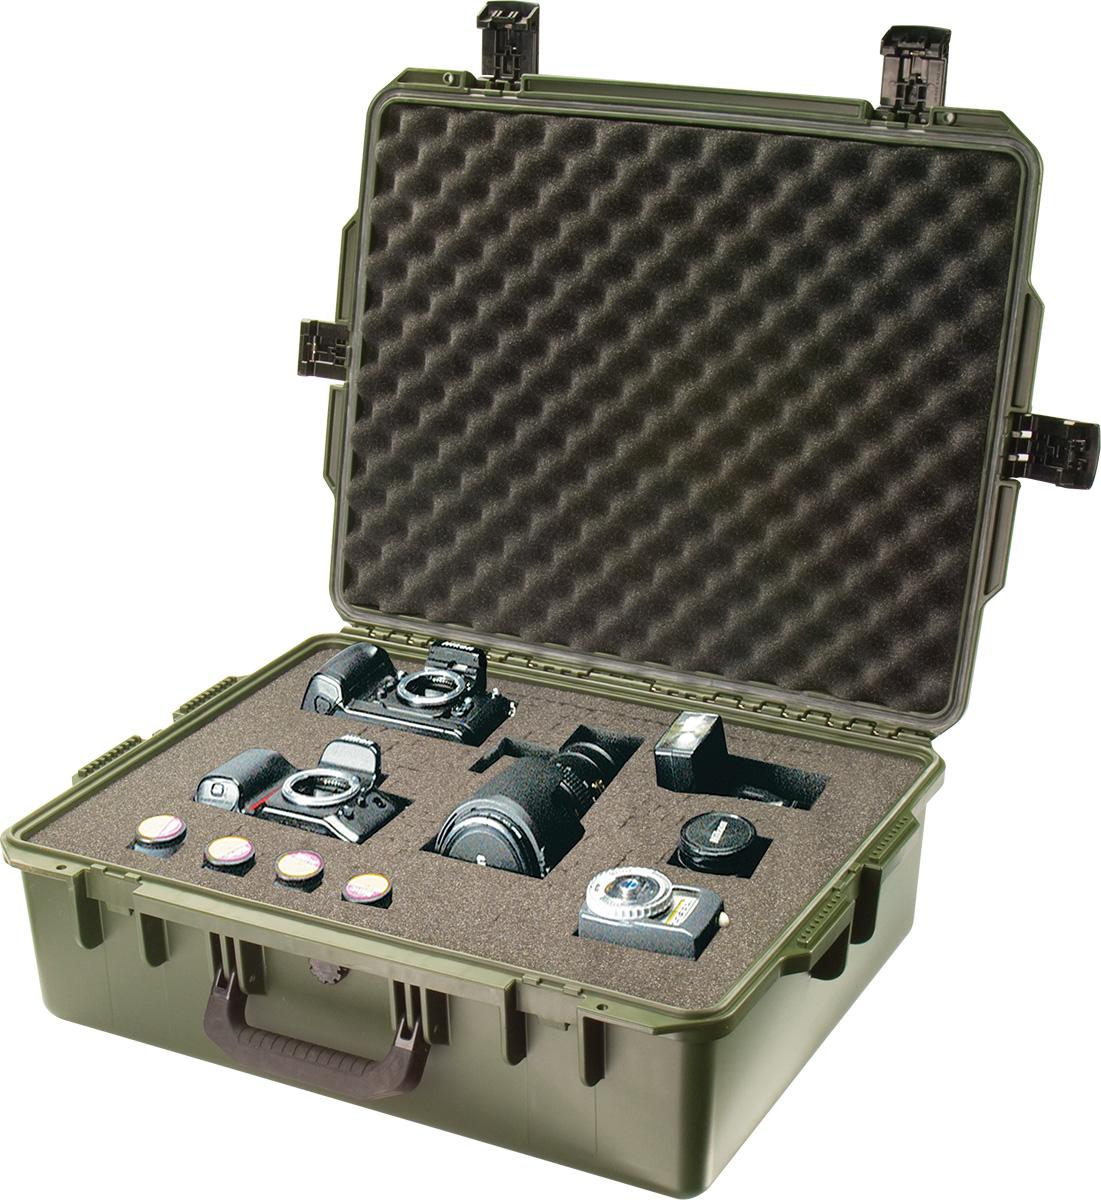 pelican im2700 storm dslr camera case